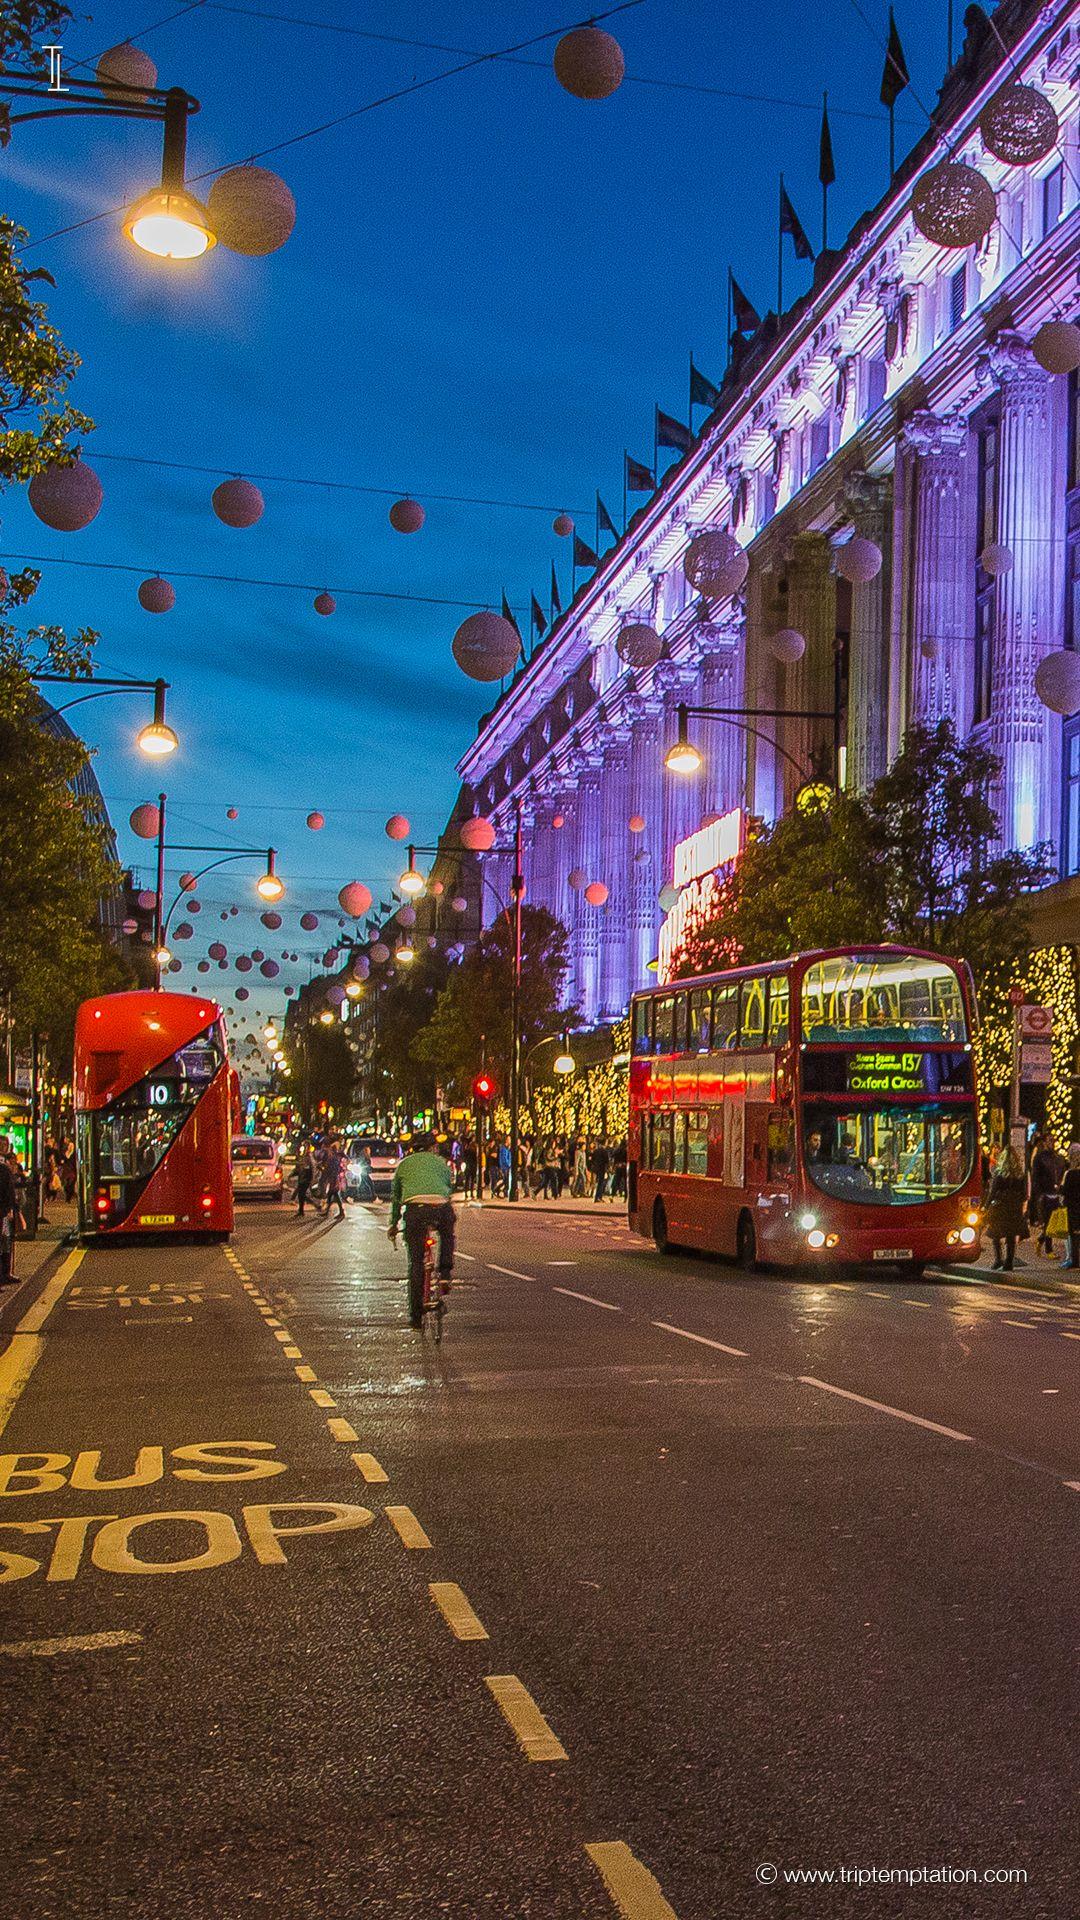 London At Night Iphone Wallpaper